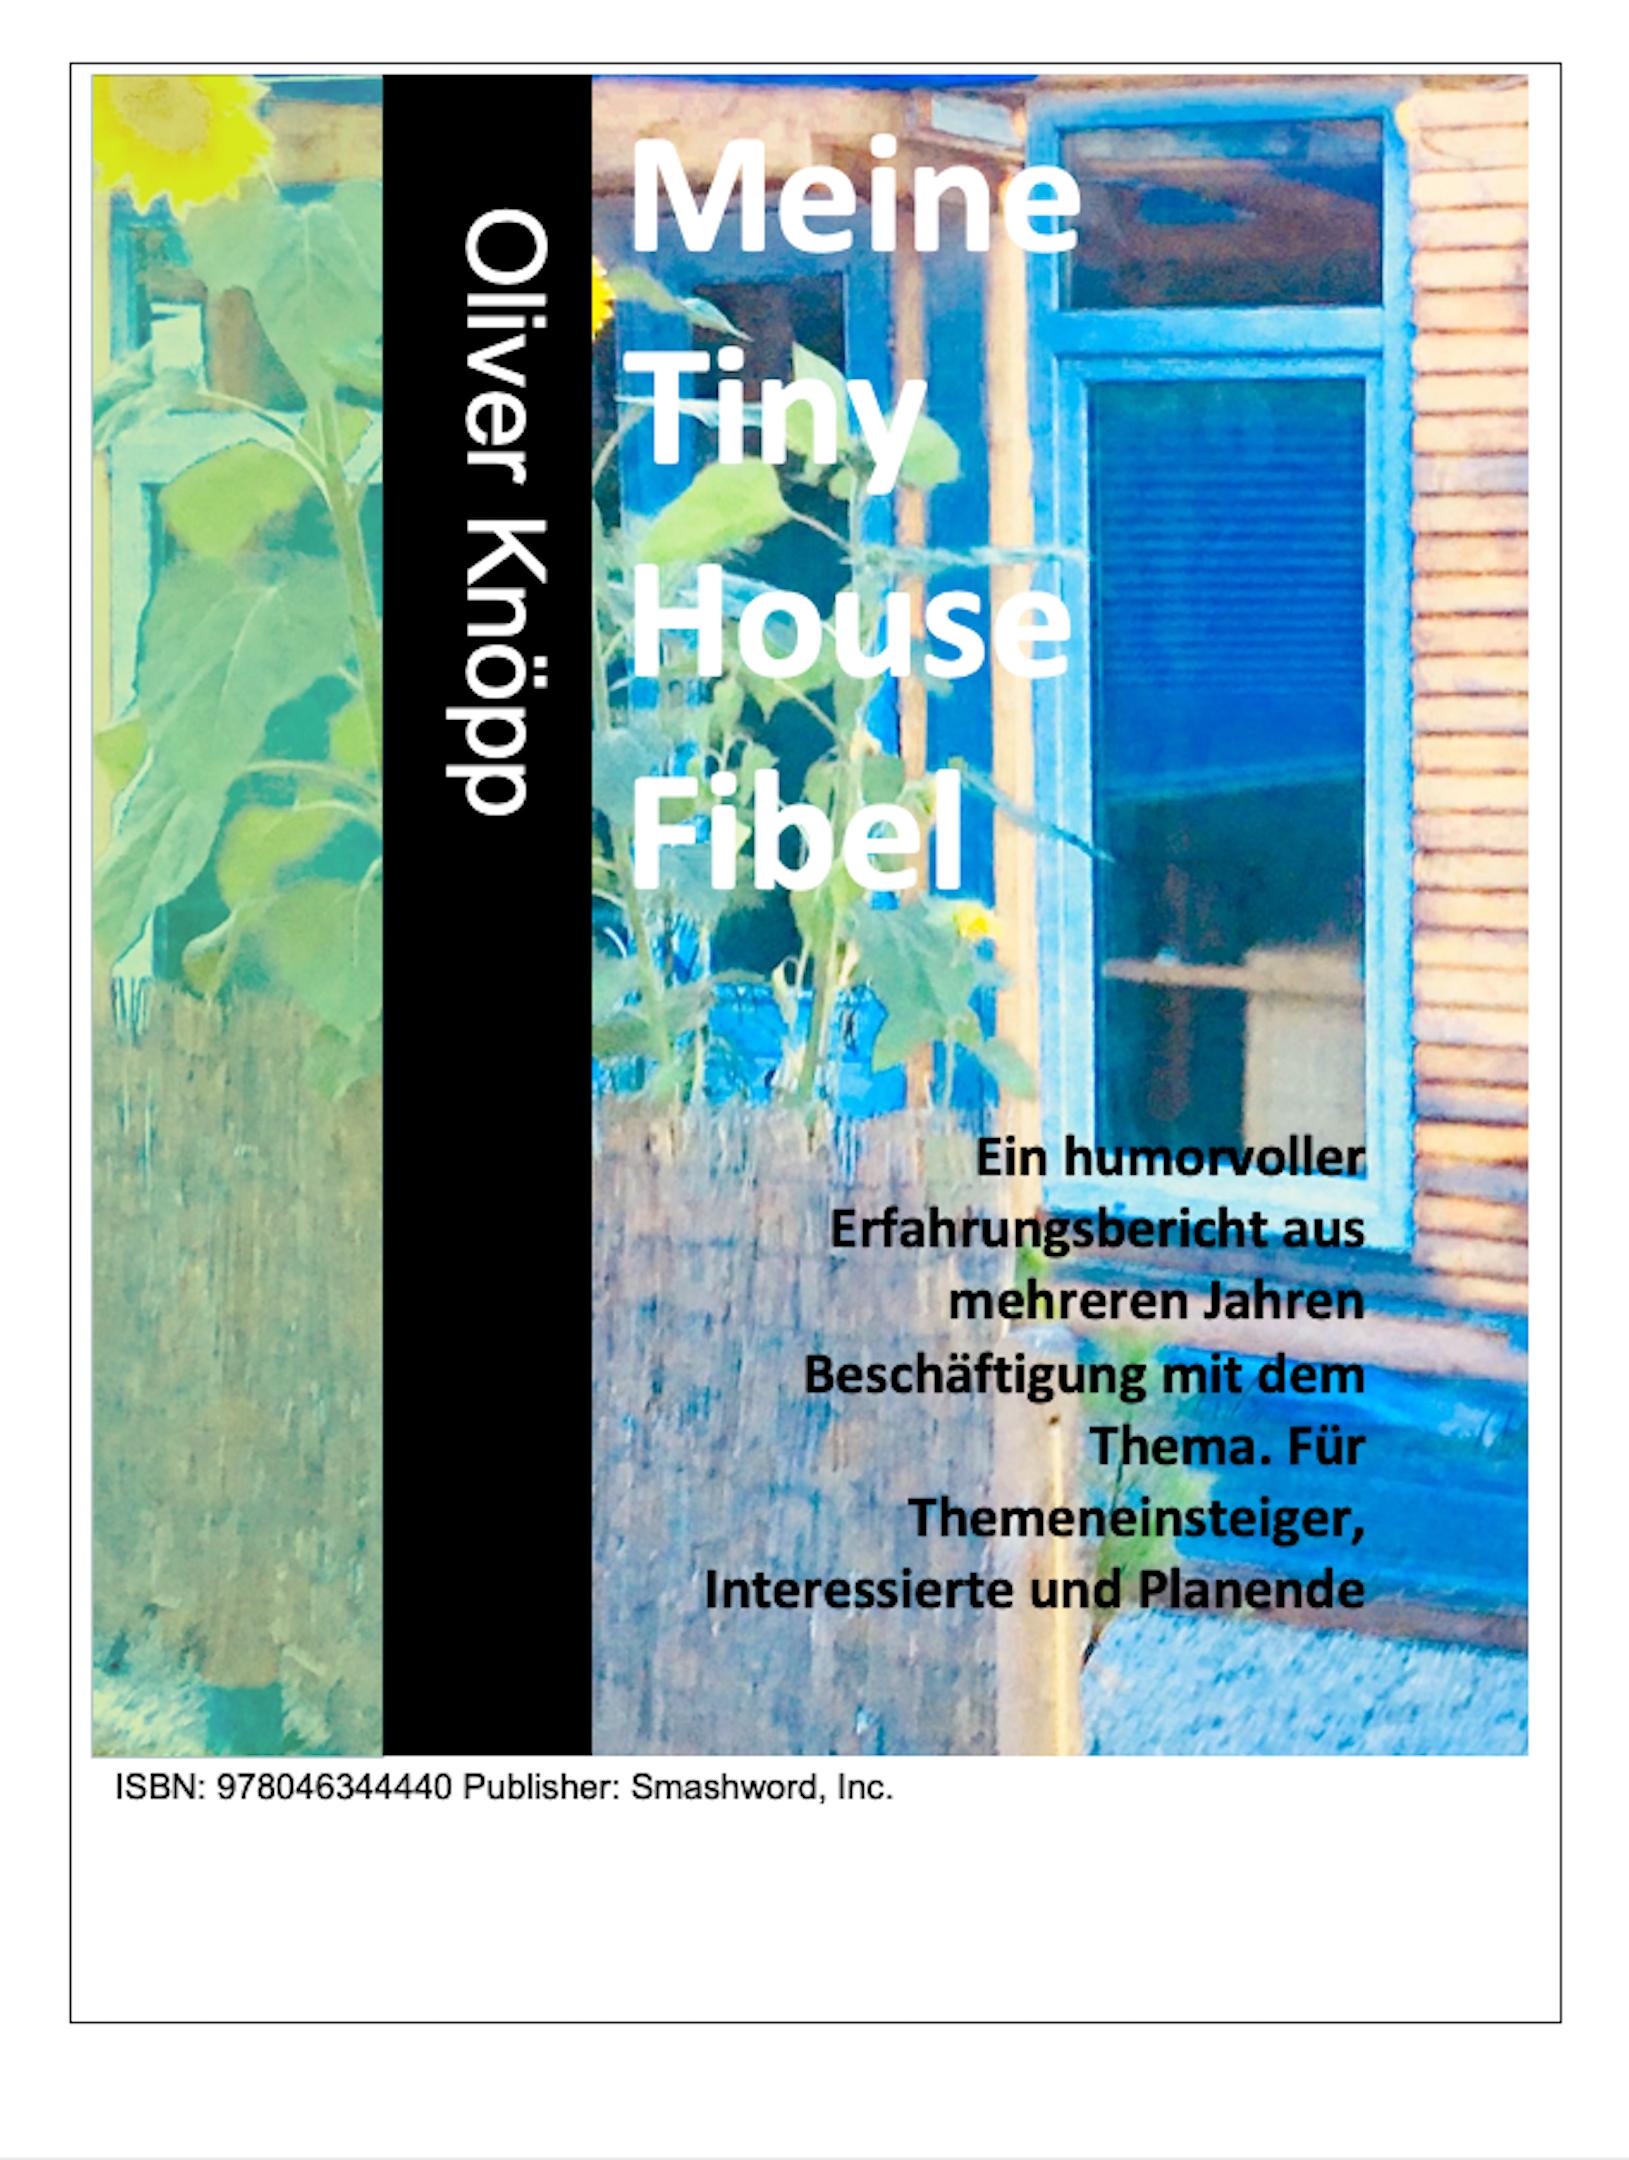 Smashwords Meine Tiny House Fibel A Book By Oliver Knoepp